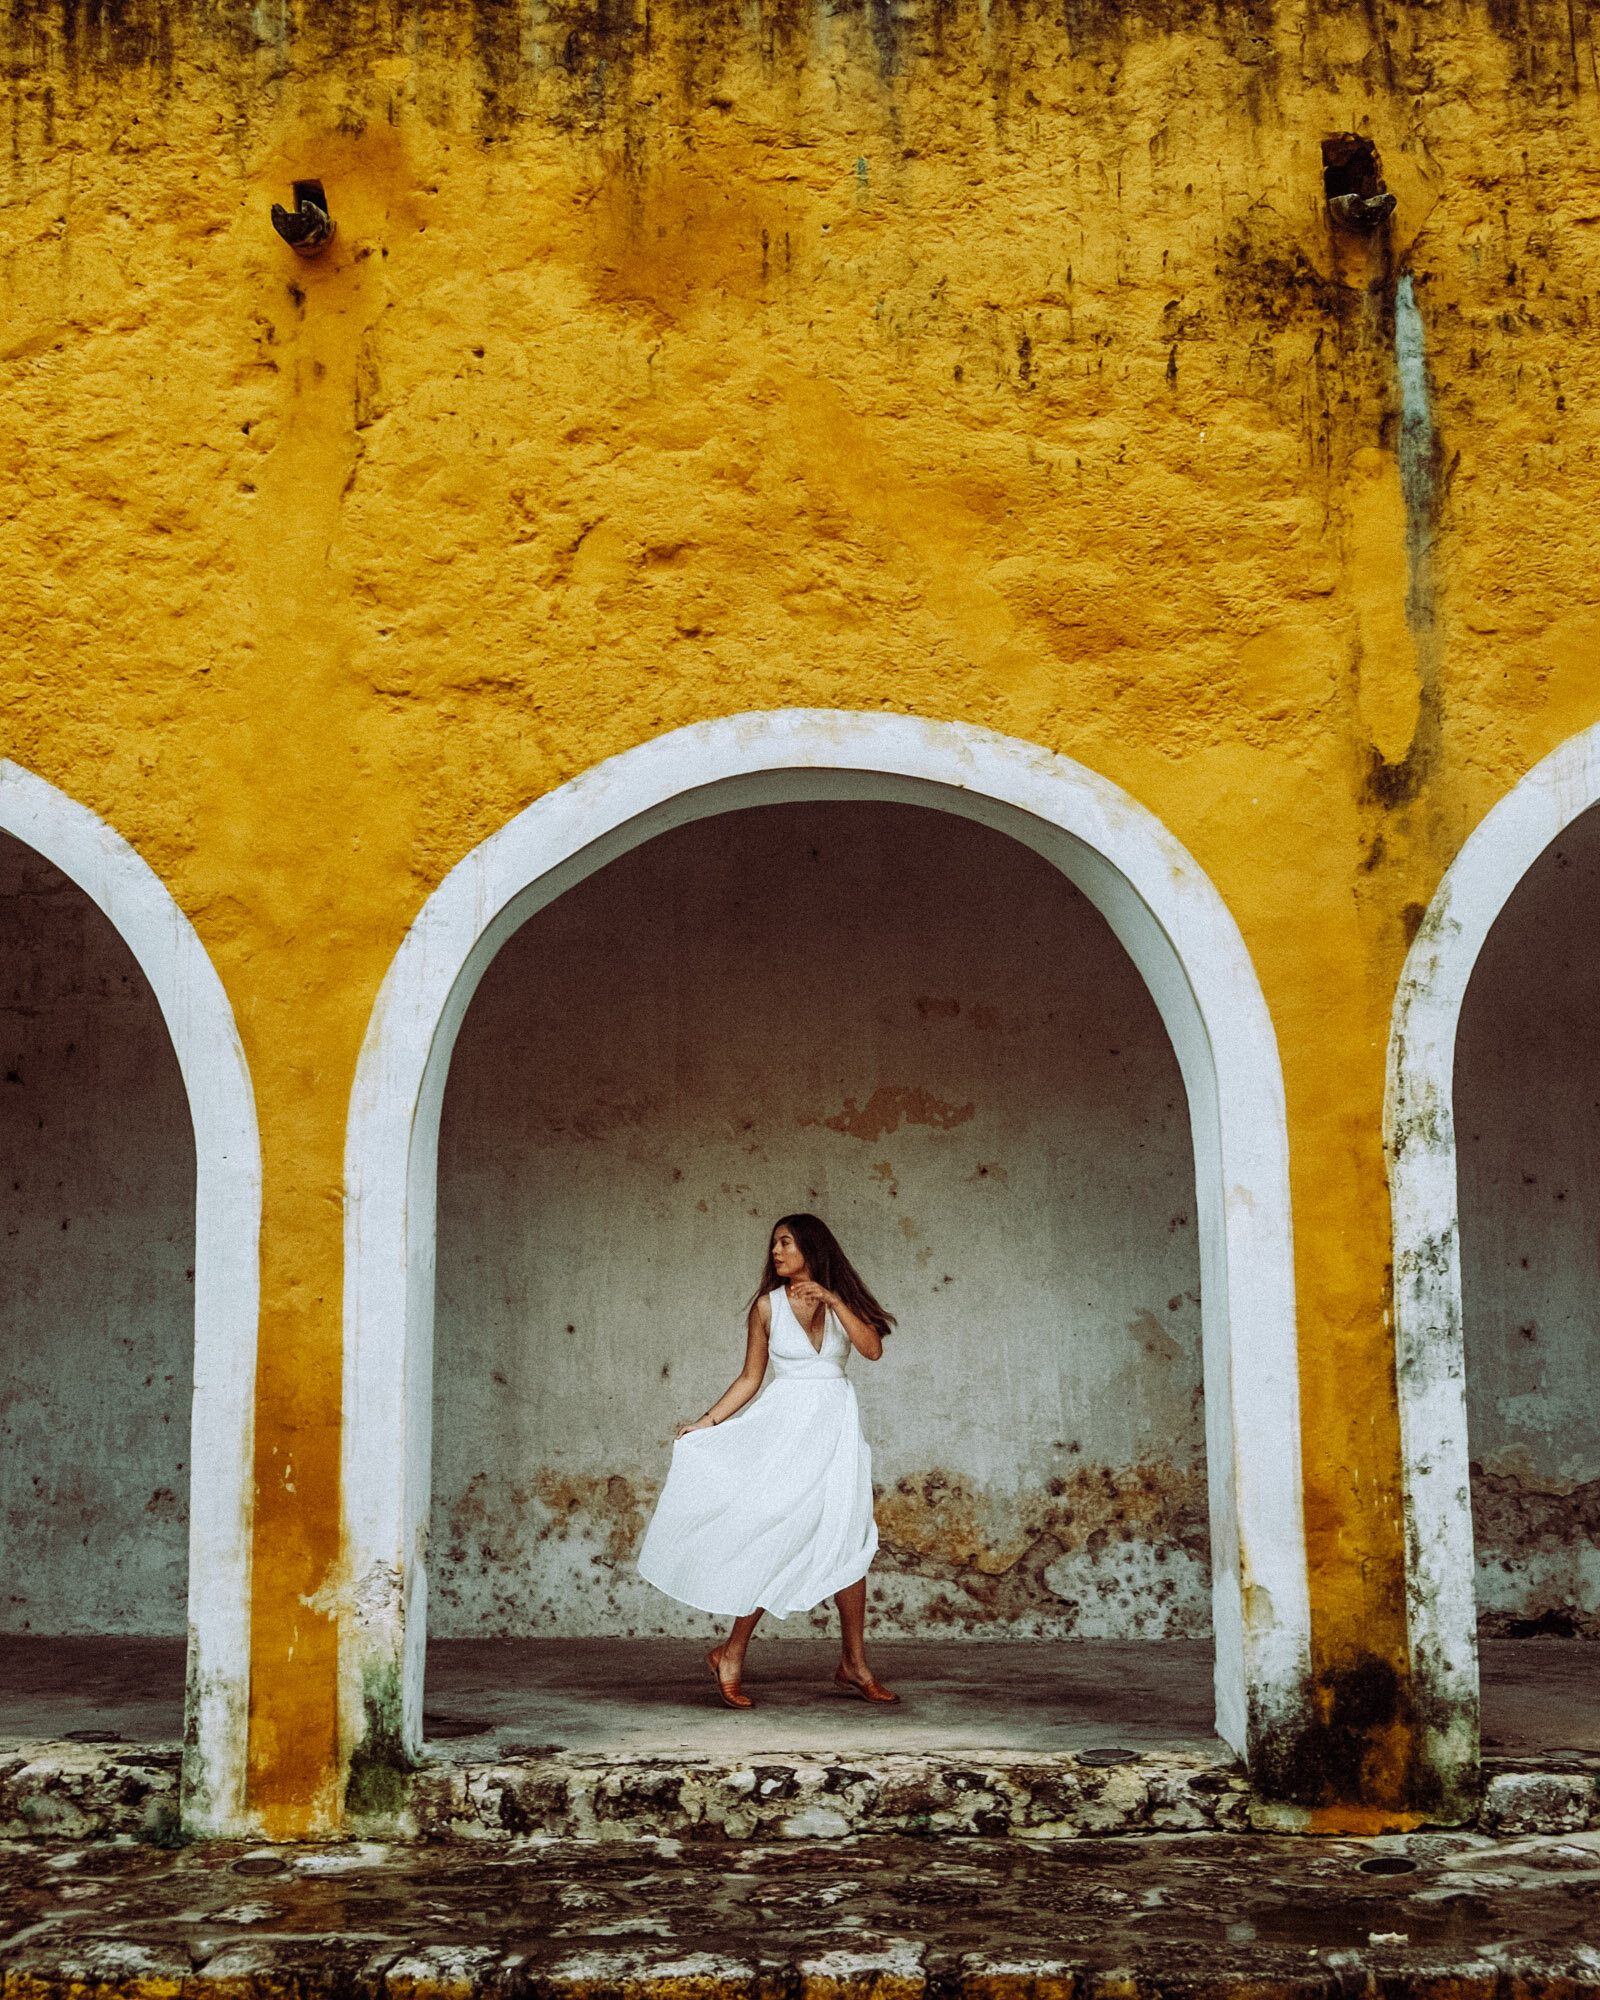 Rachel Off Duty: A Woman Framed in an Archway in Izamal, Mexico